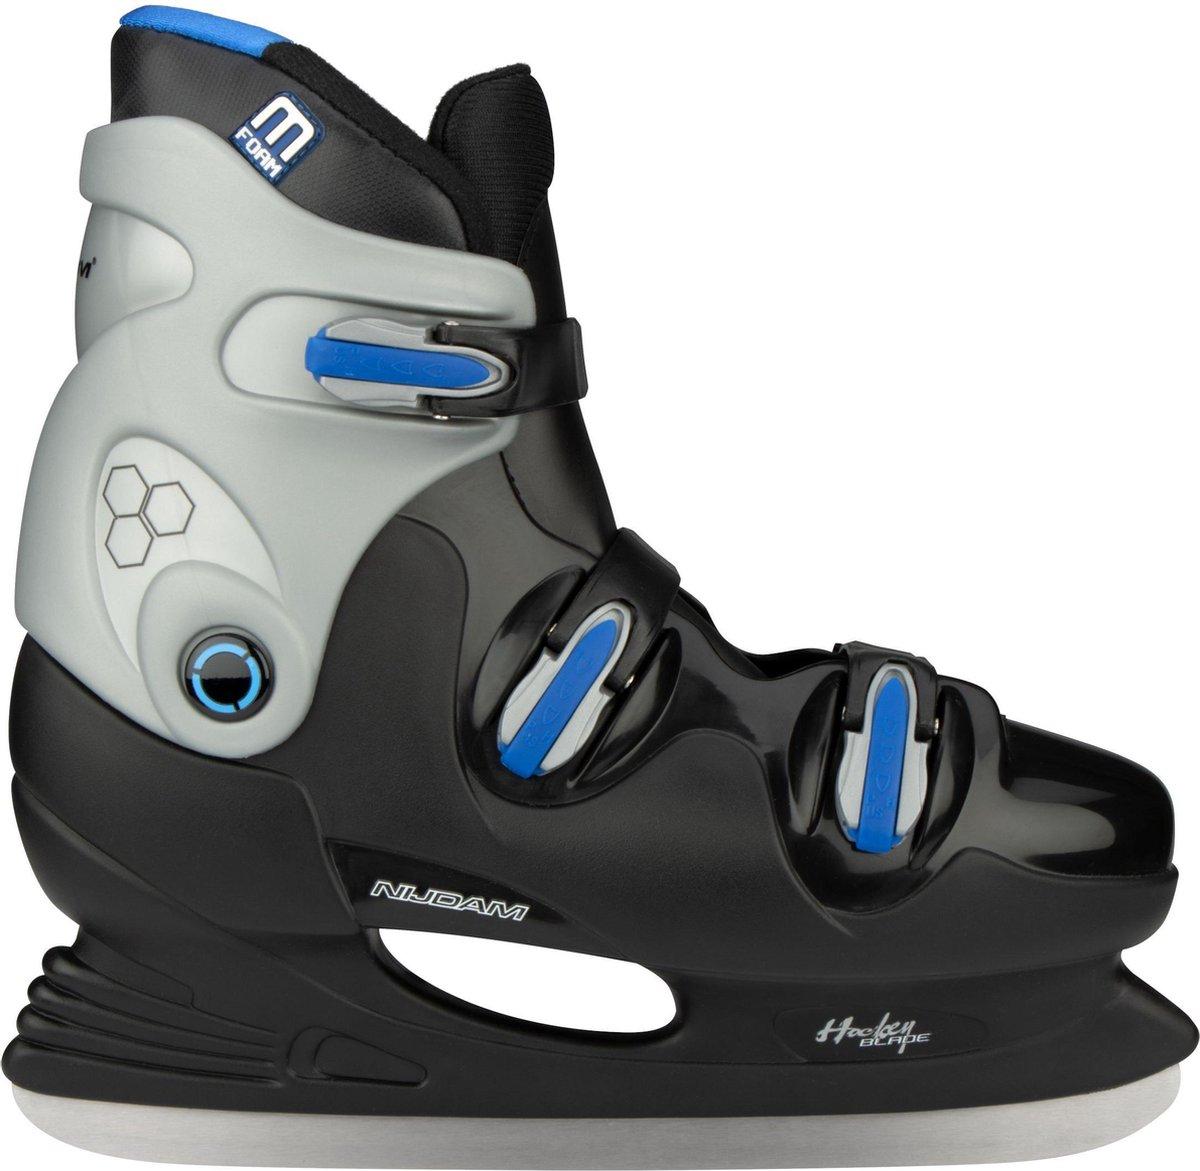 Nijdam IJshockeyschaats - Hardboot - Zwart/Blauw - Maat 37